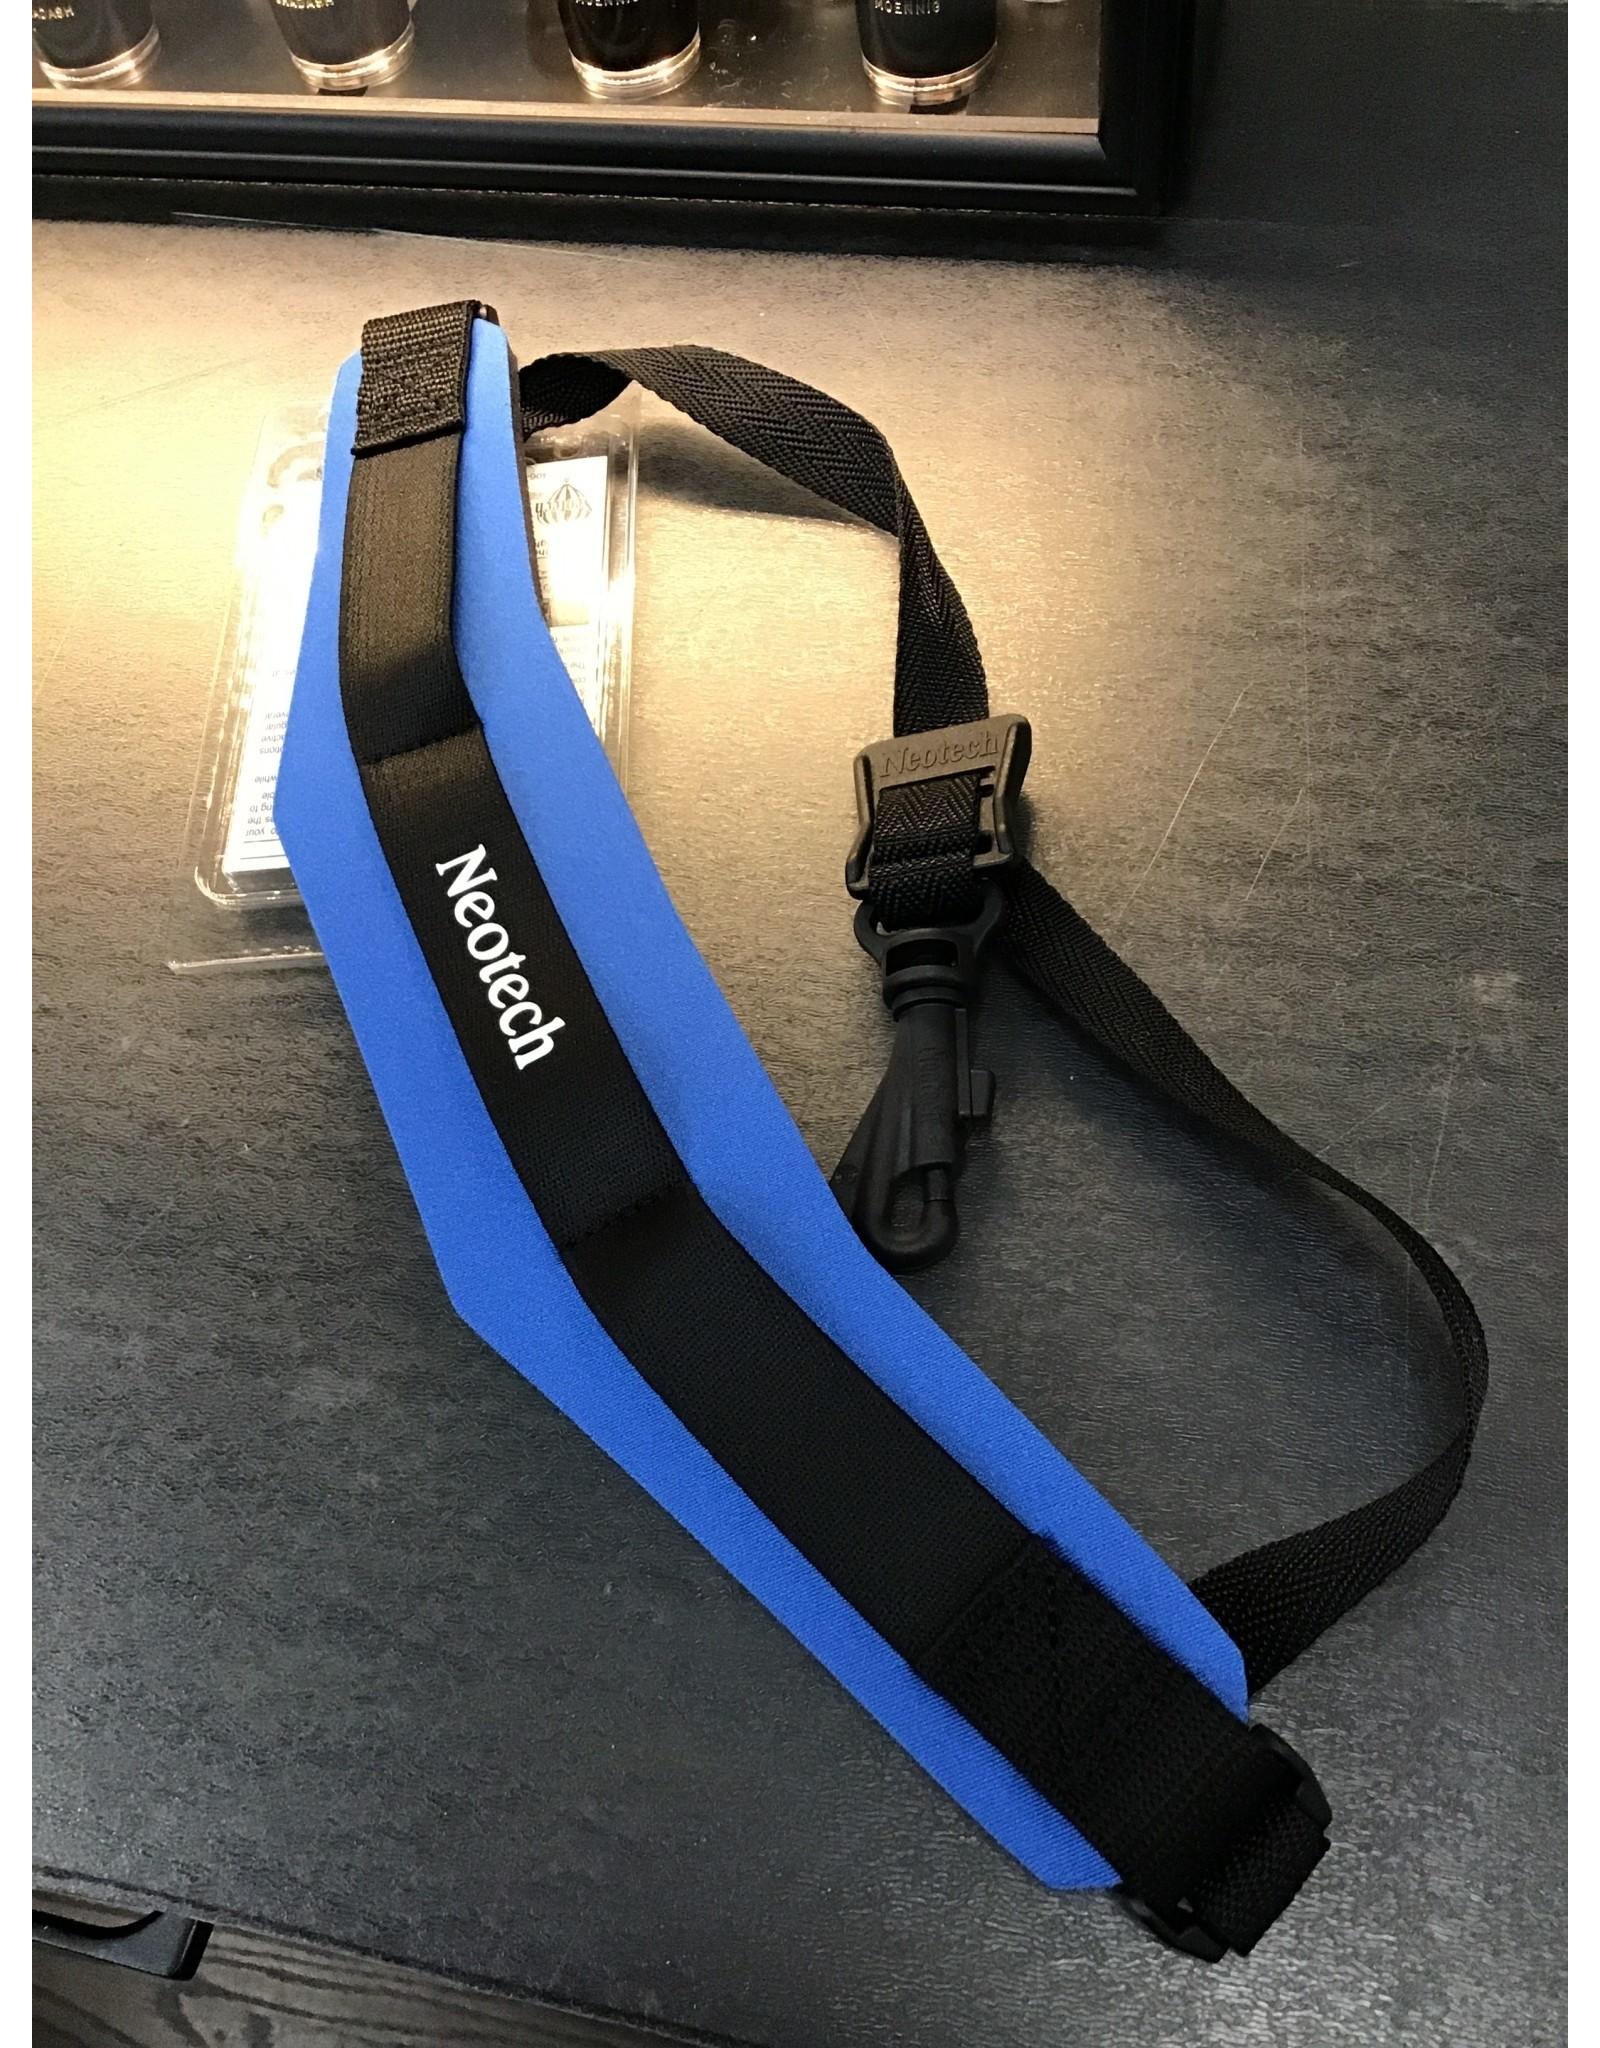 NeoTech Neotec Soft Sax Strap Swivel Hook - Royal Blue